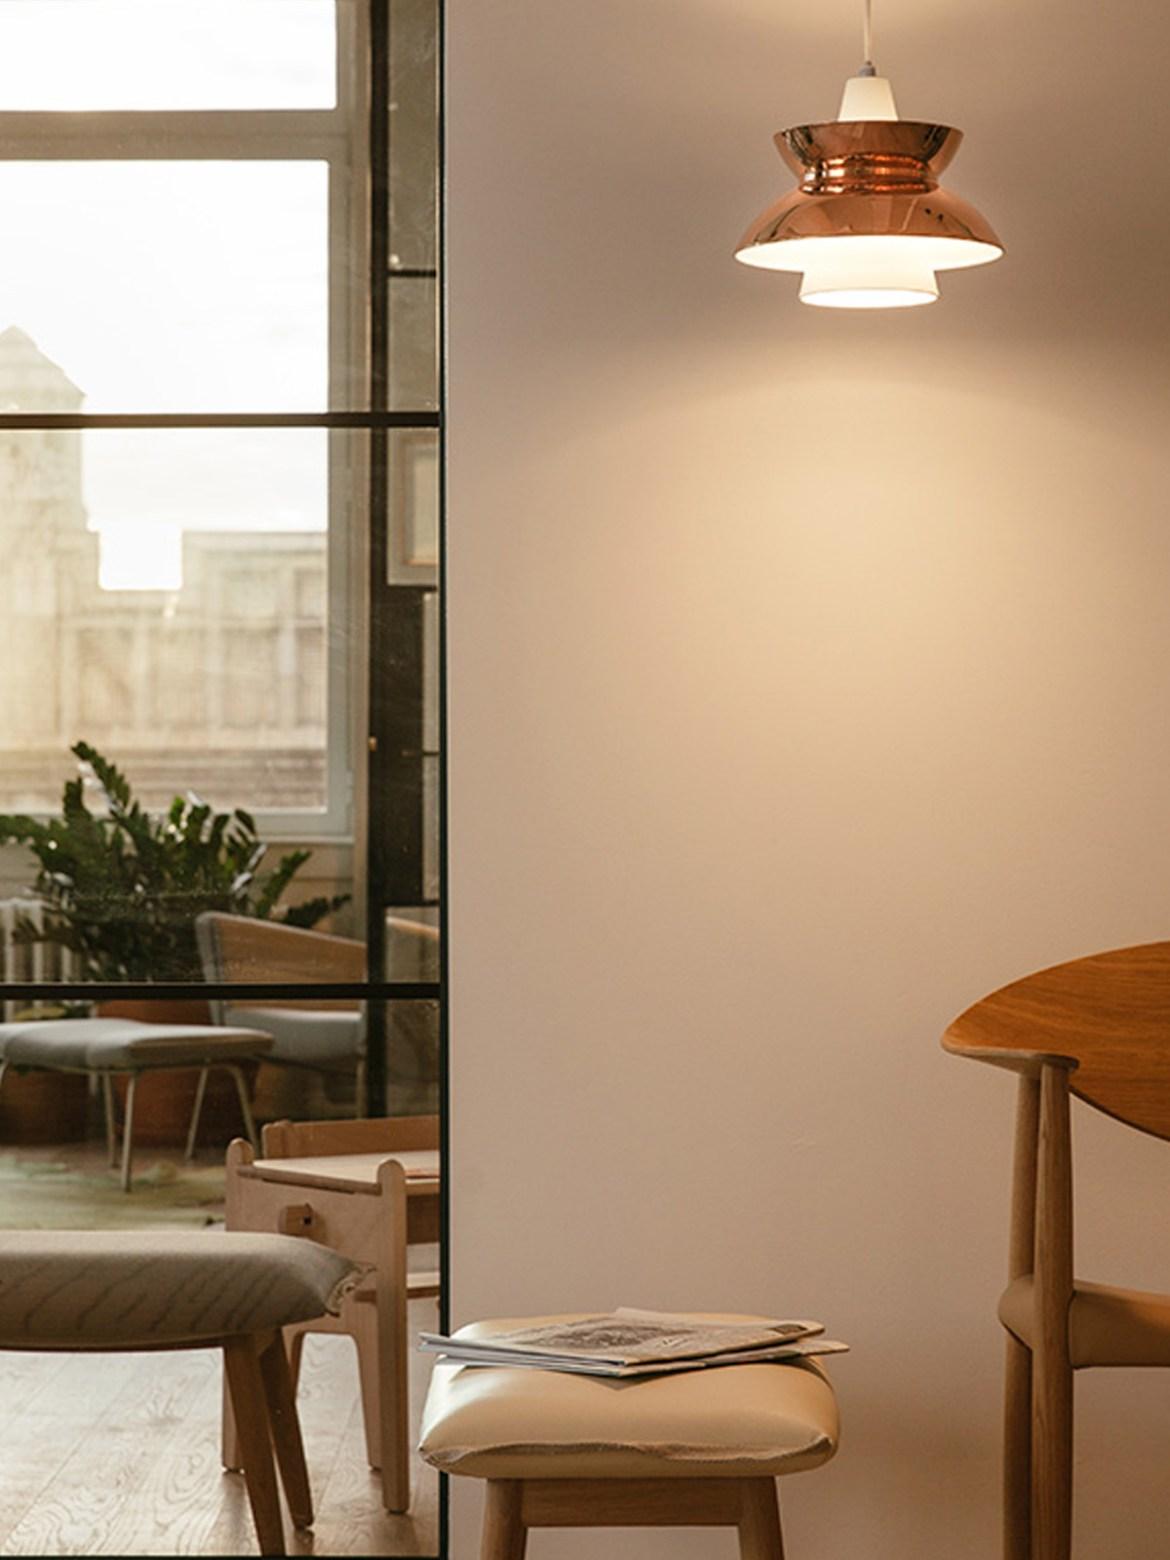 DesignOrt BLog: Kupferleuchten Doo-Wop Lampe Kupfer Poulsen